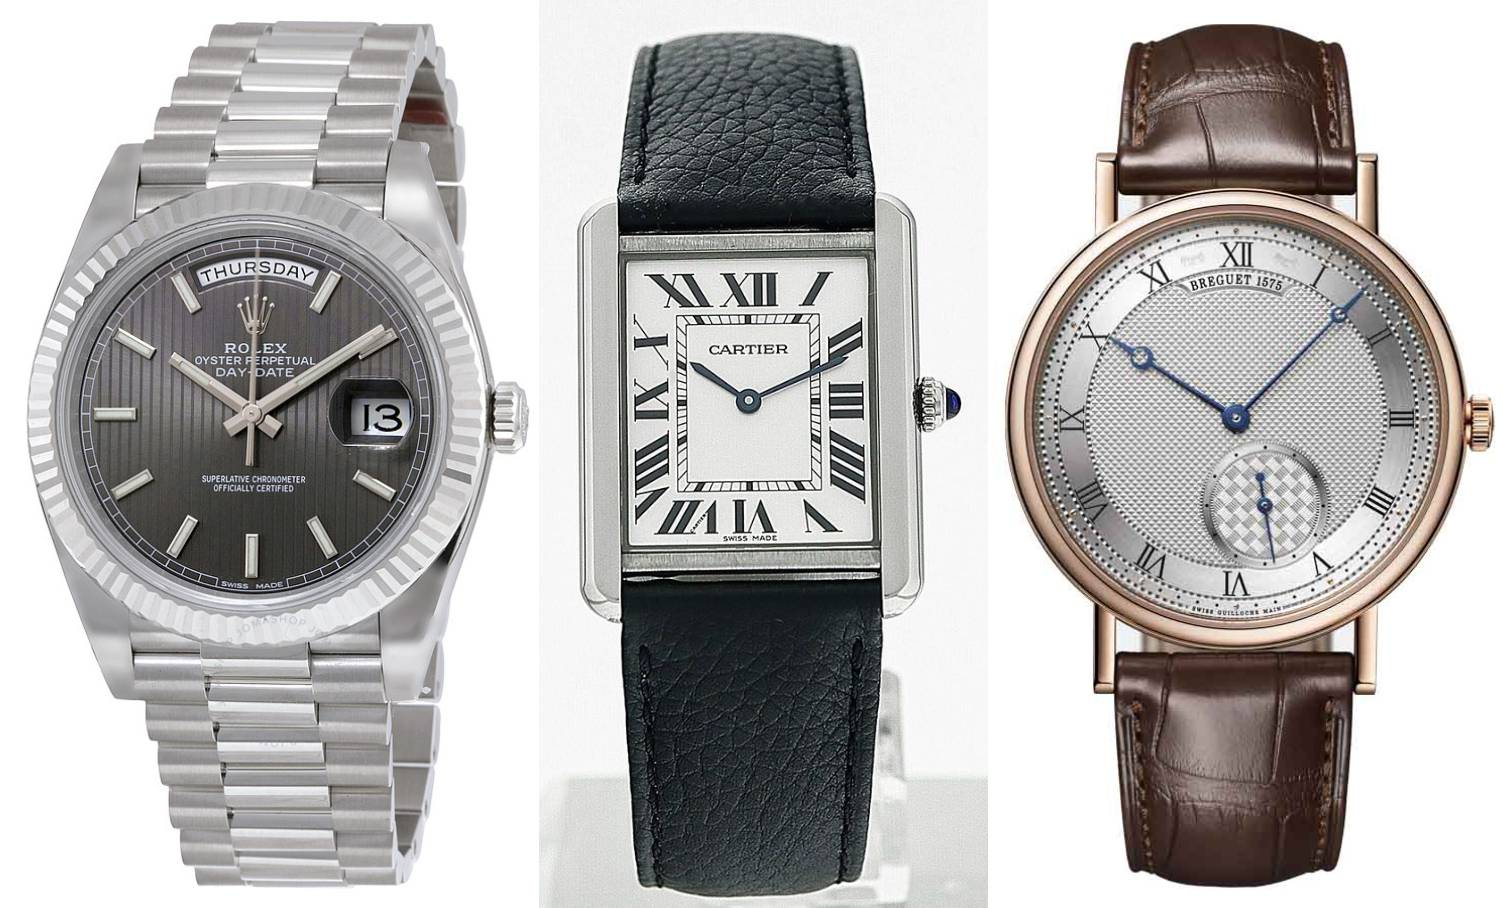 5 klasika za mušku eleganciju: Od Rolexa, Pateka do Cartiera